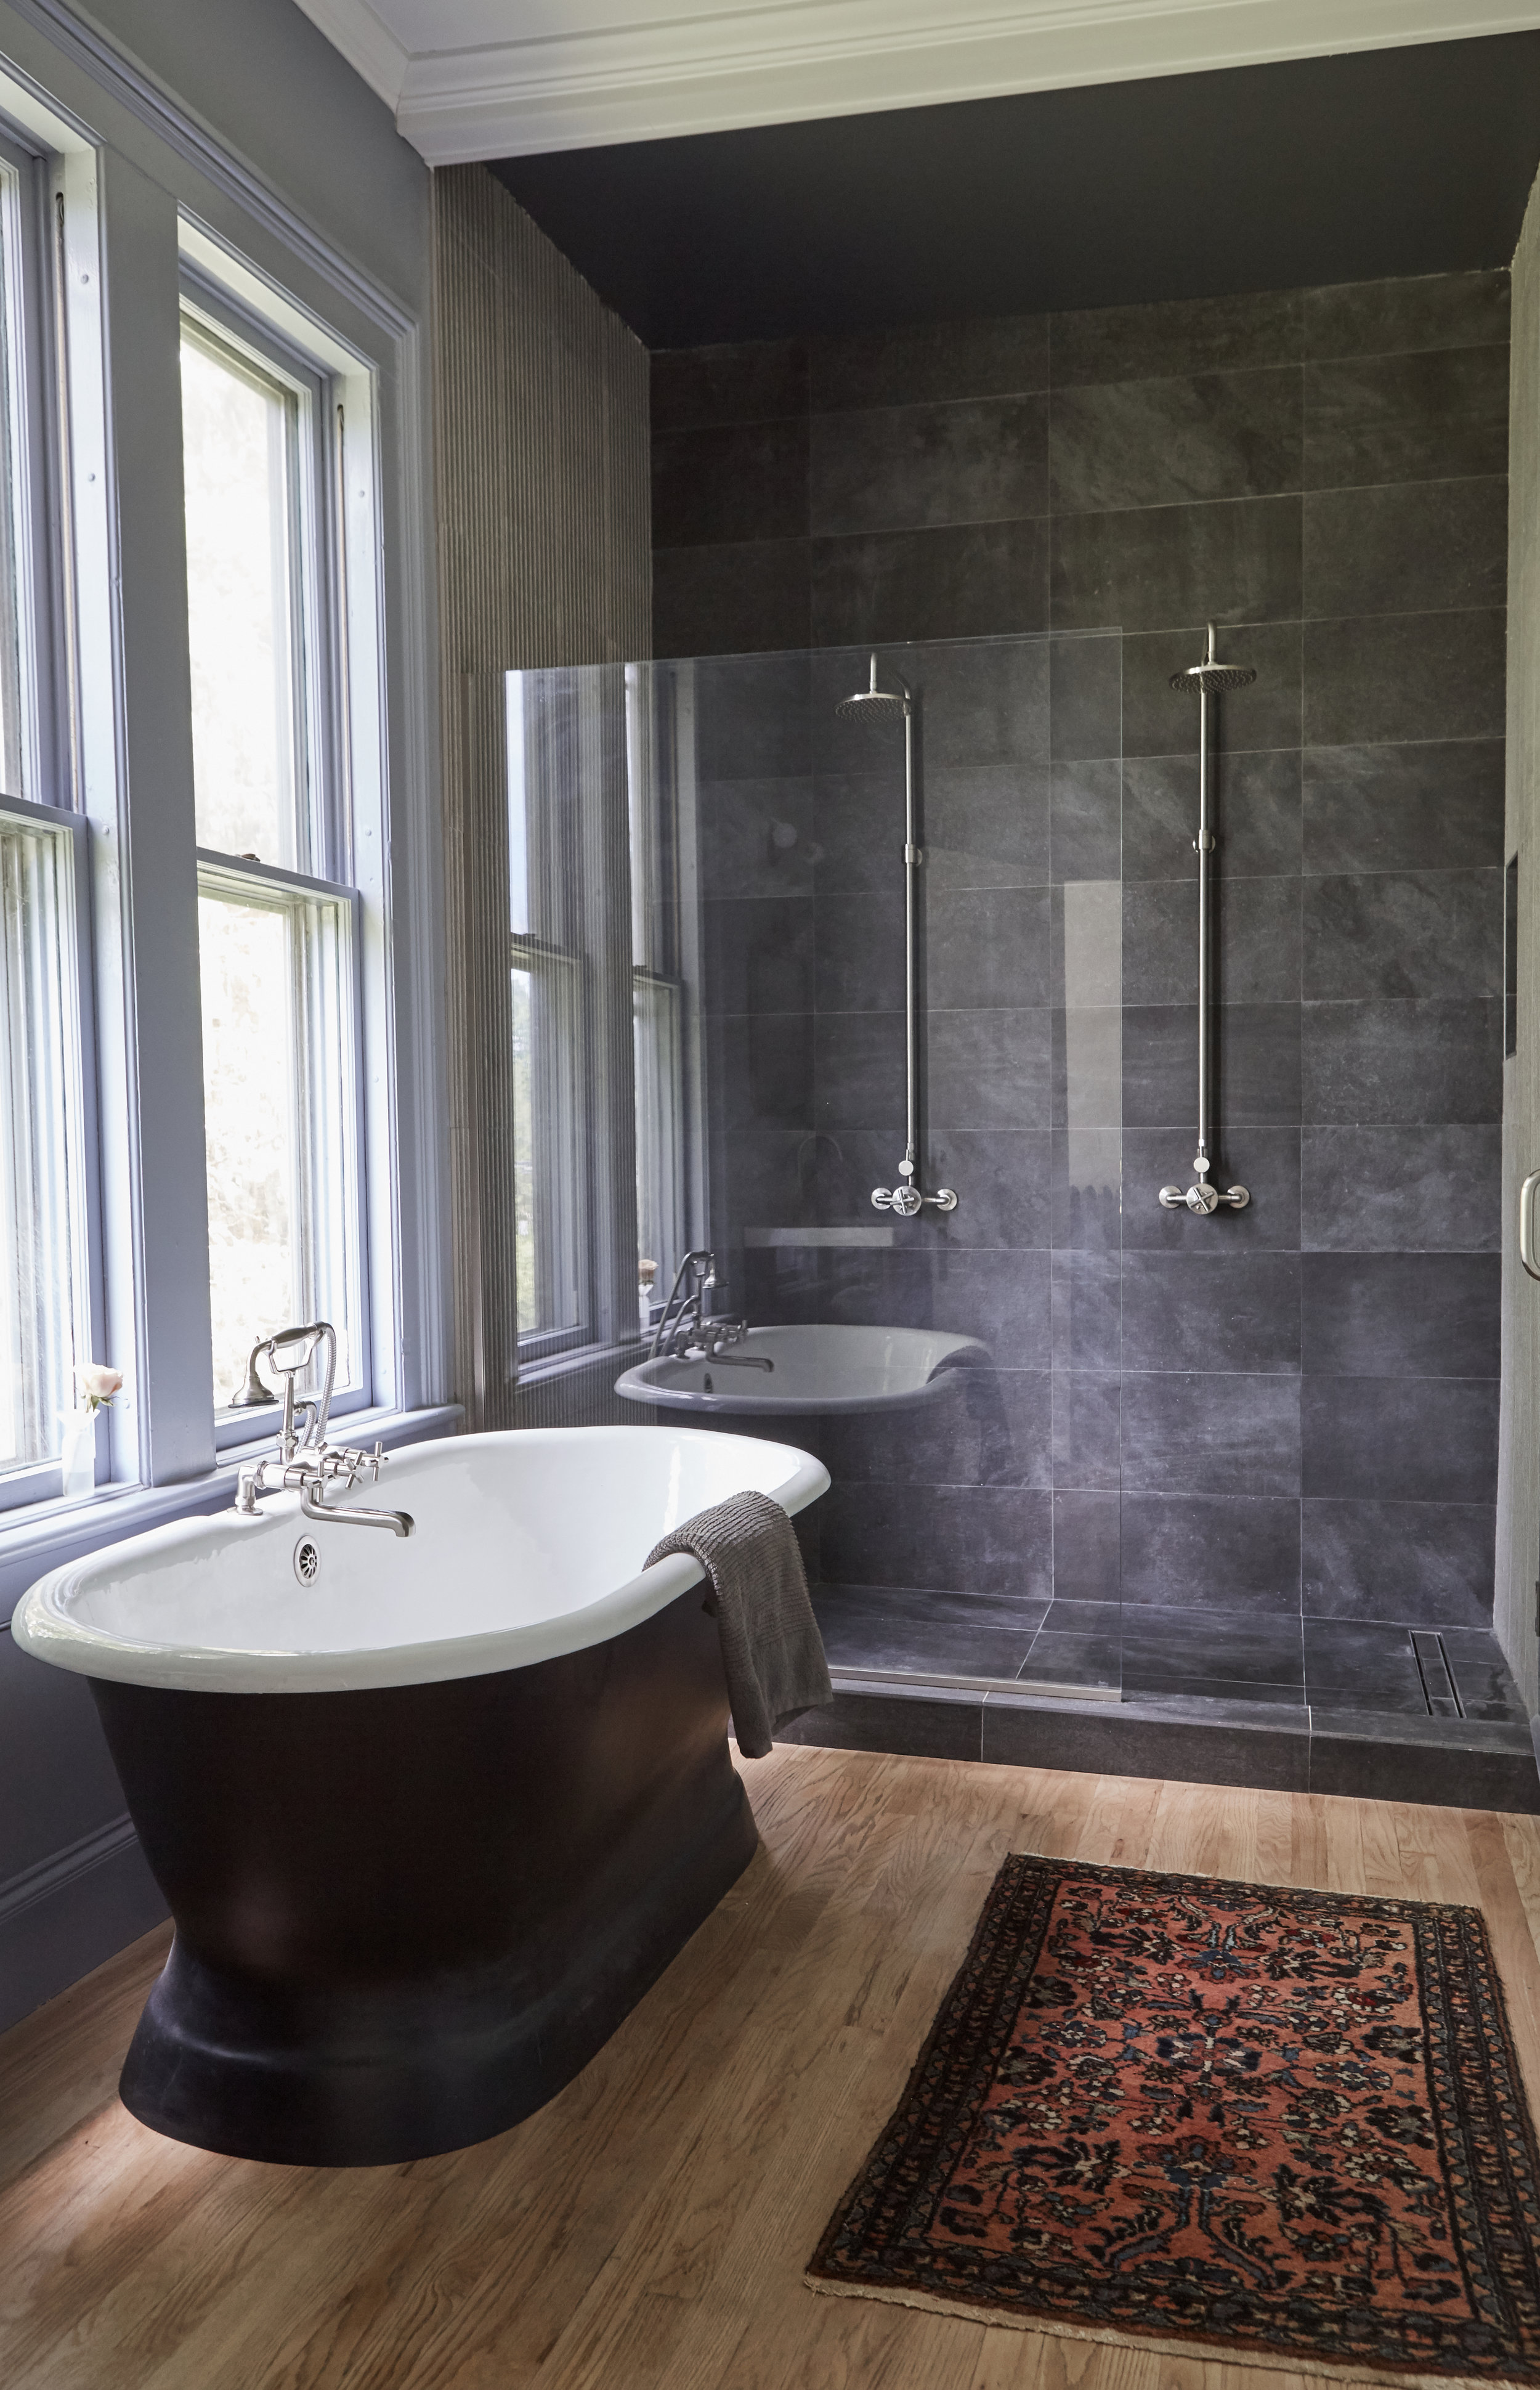 East Bath